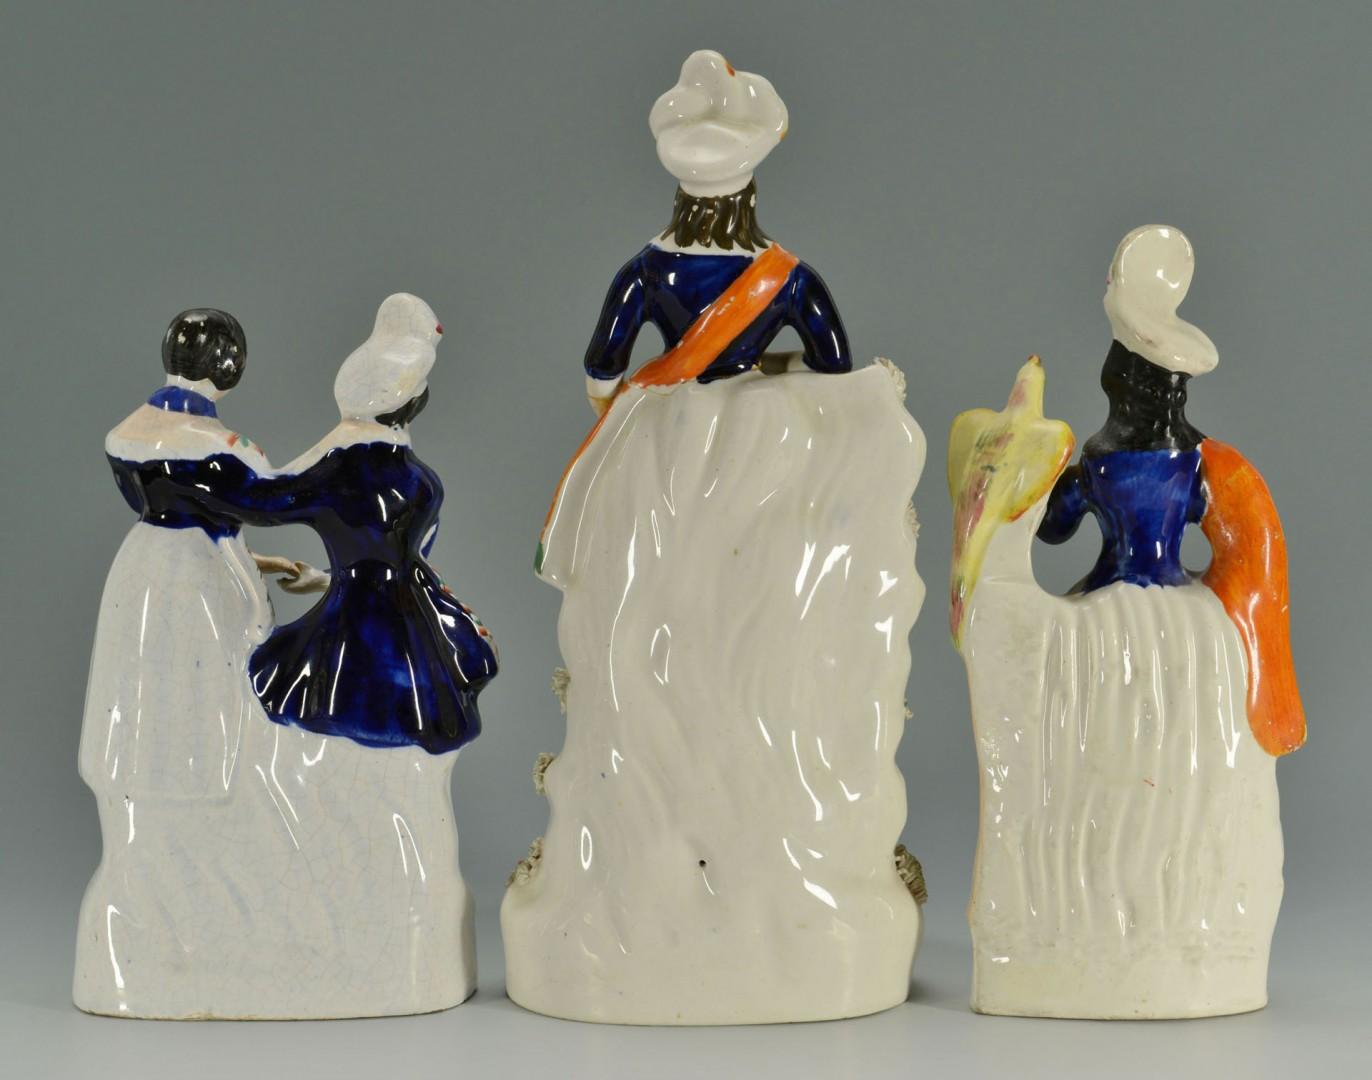 Lot 273: Grouping of 3 Tartan Staffordshire Figures